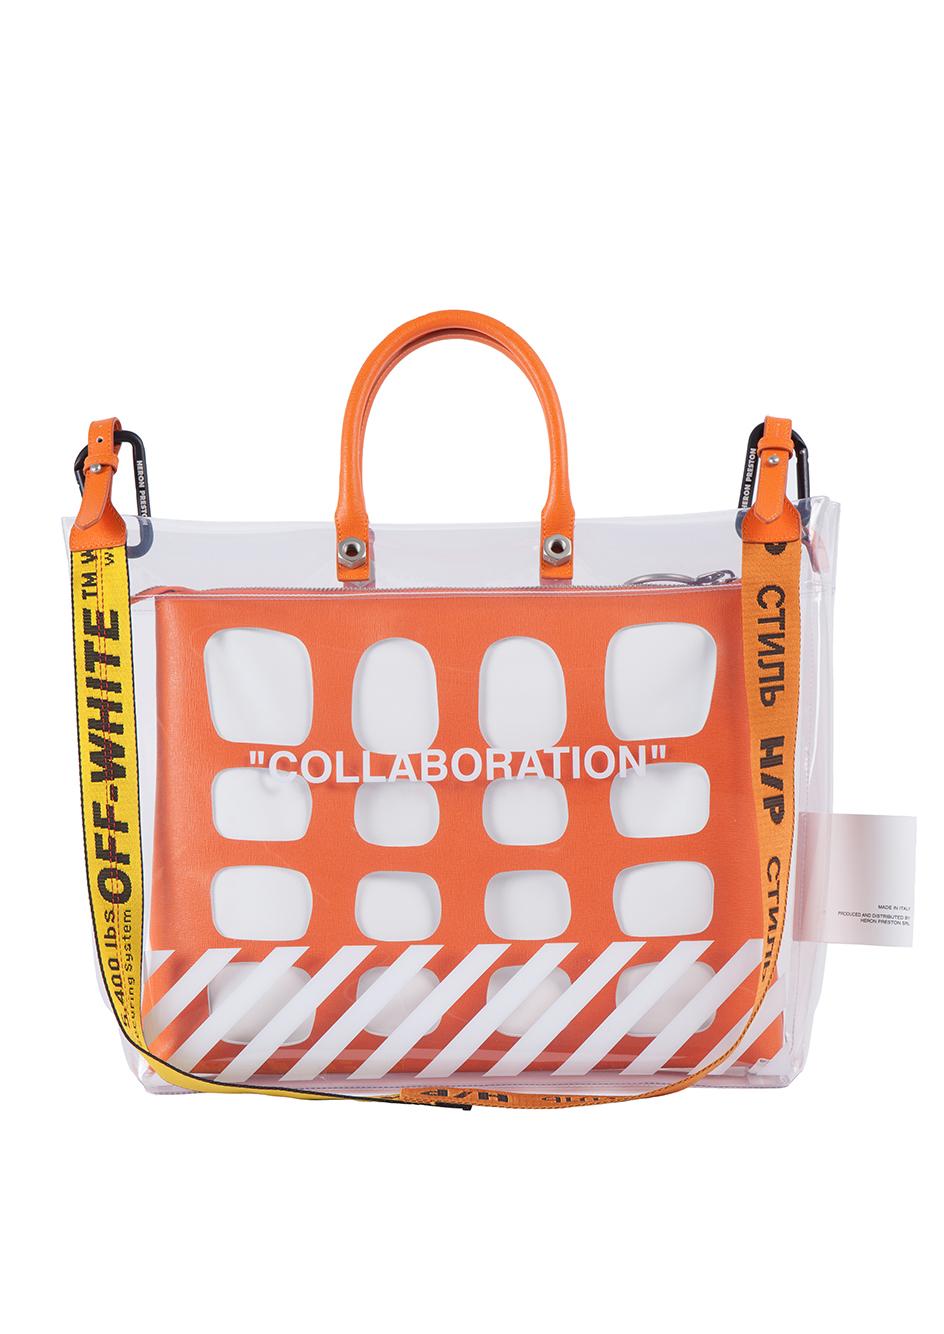 Kolor Magazine Off-White and Heron Preston Have Collaborated on A Unisex Handbag 1.jpg